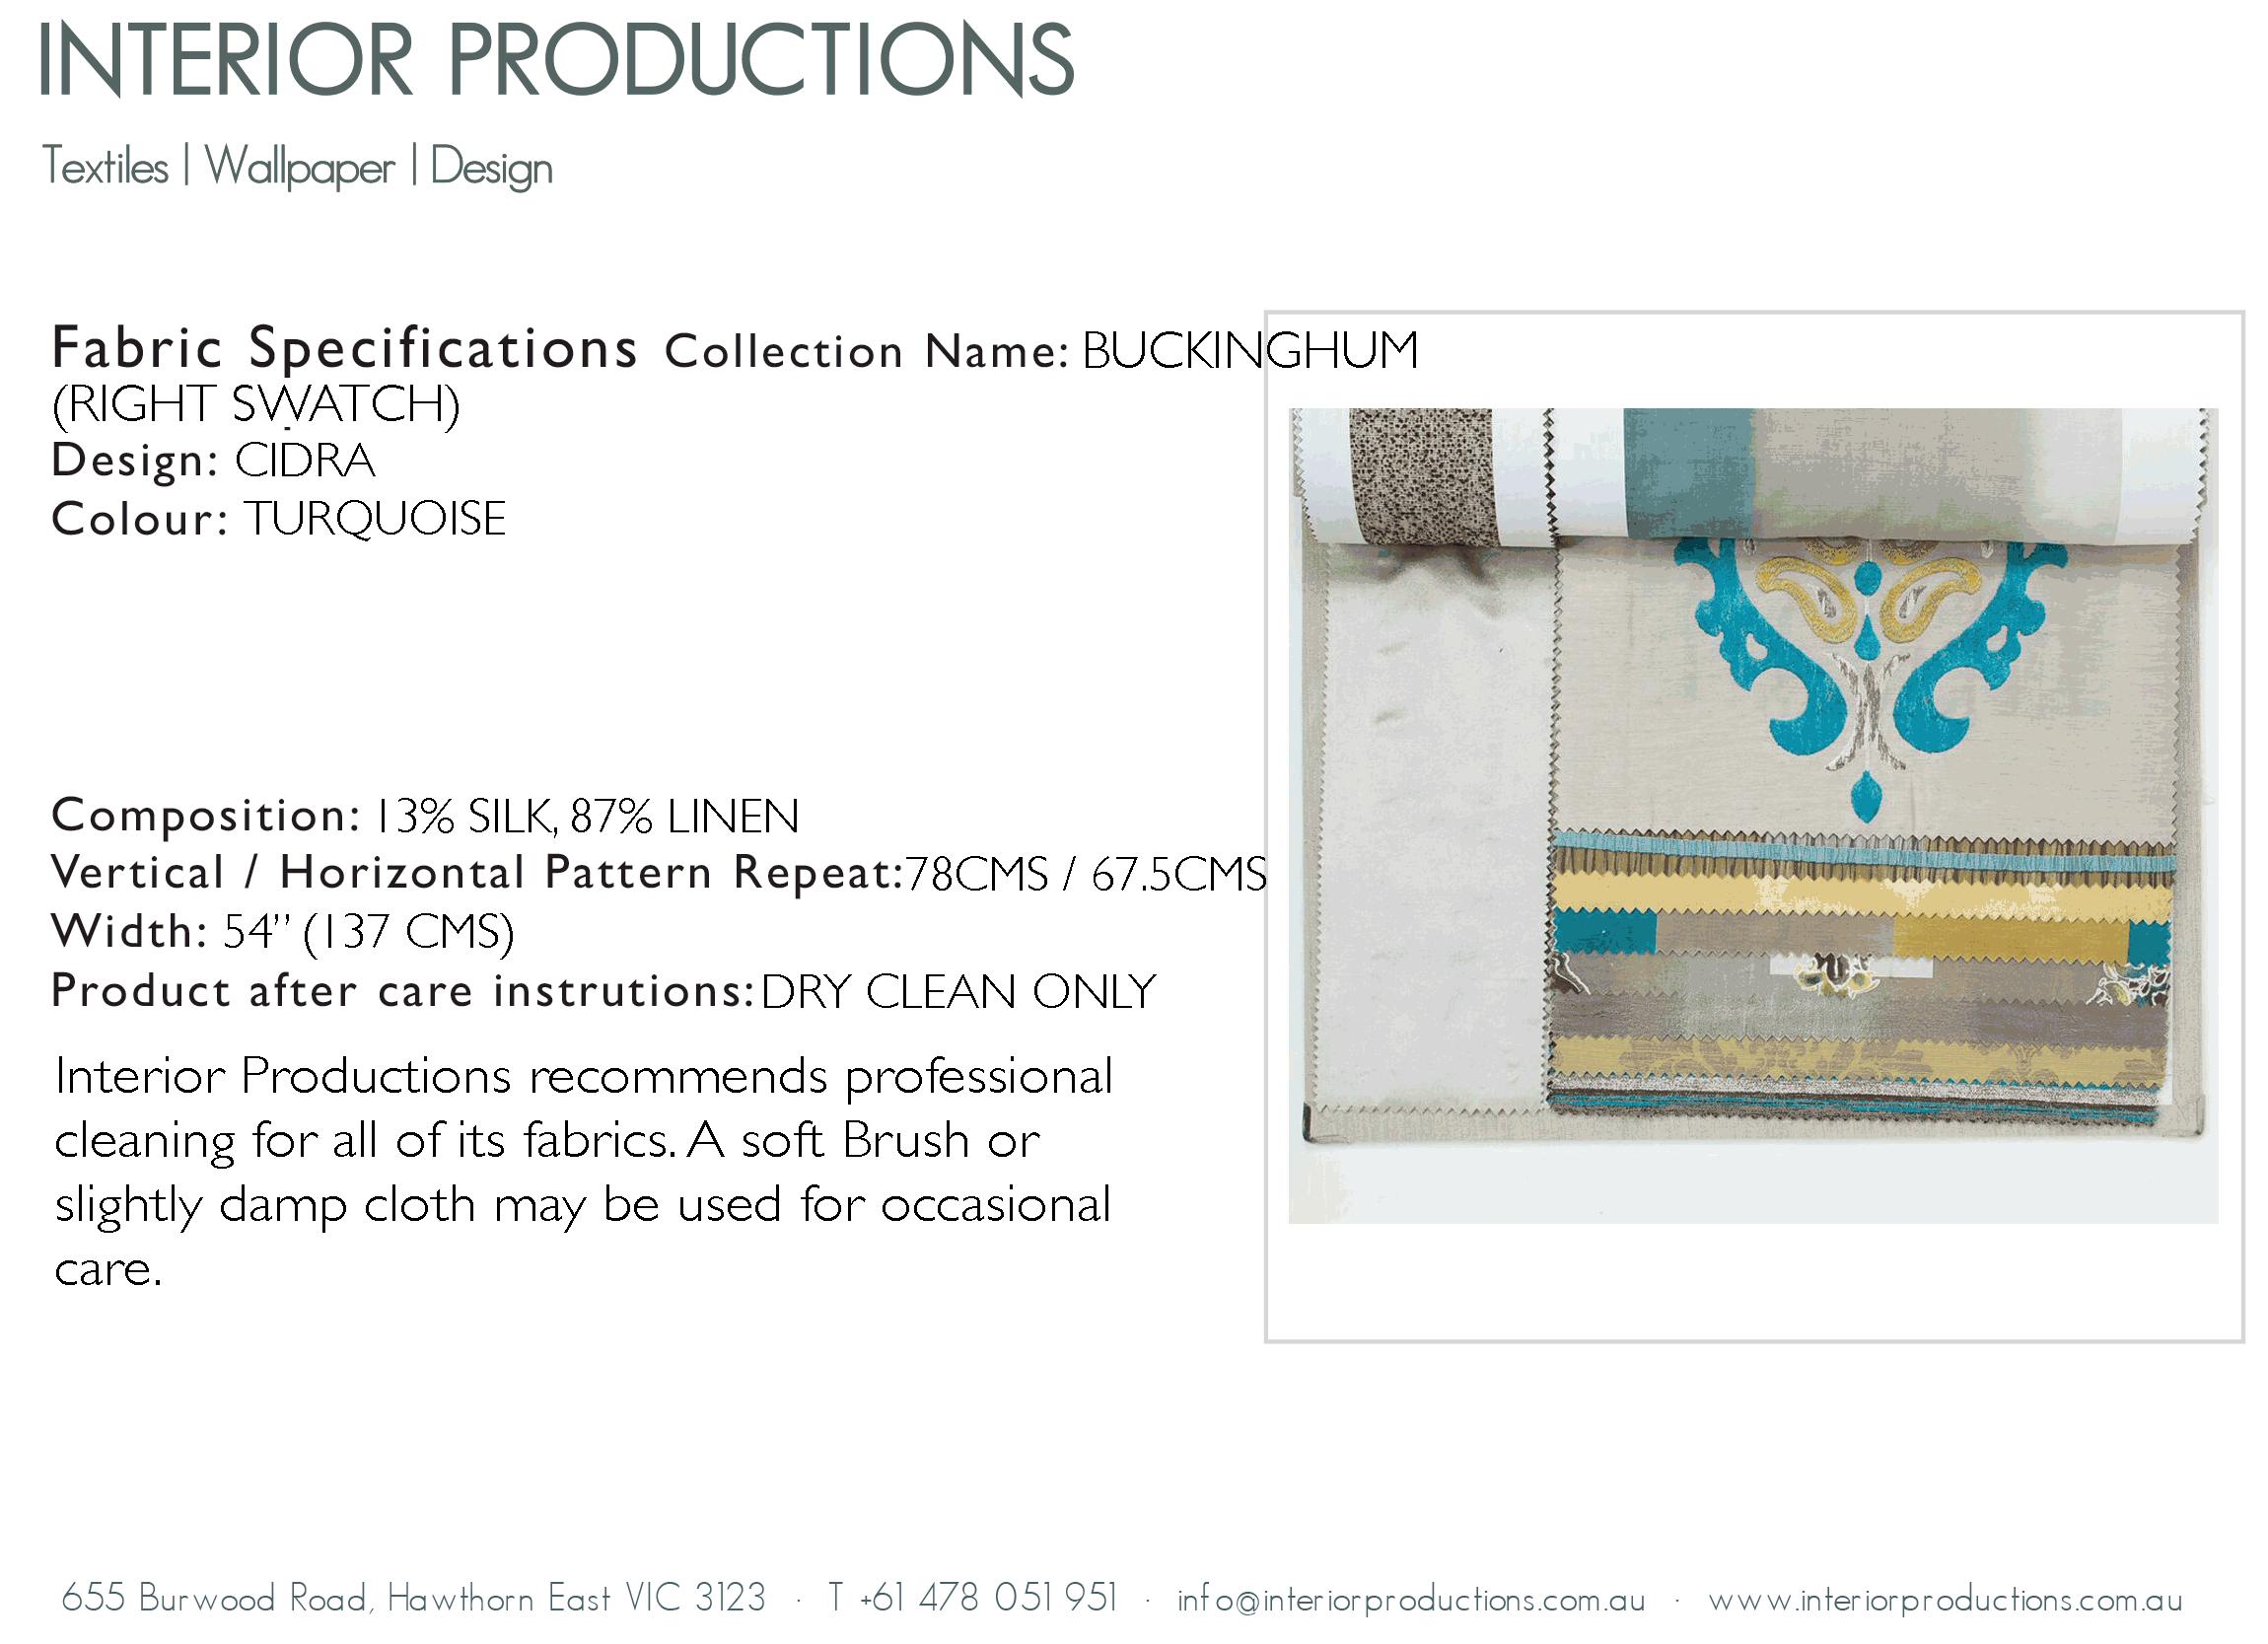 interior_productions_CIDRA---TURQUOISE